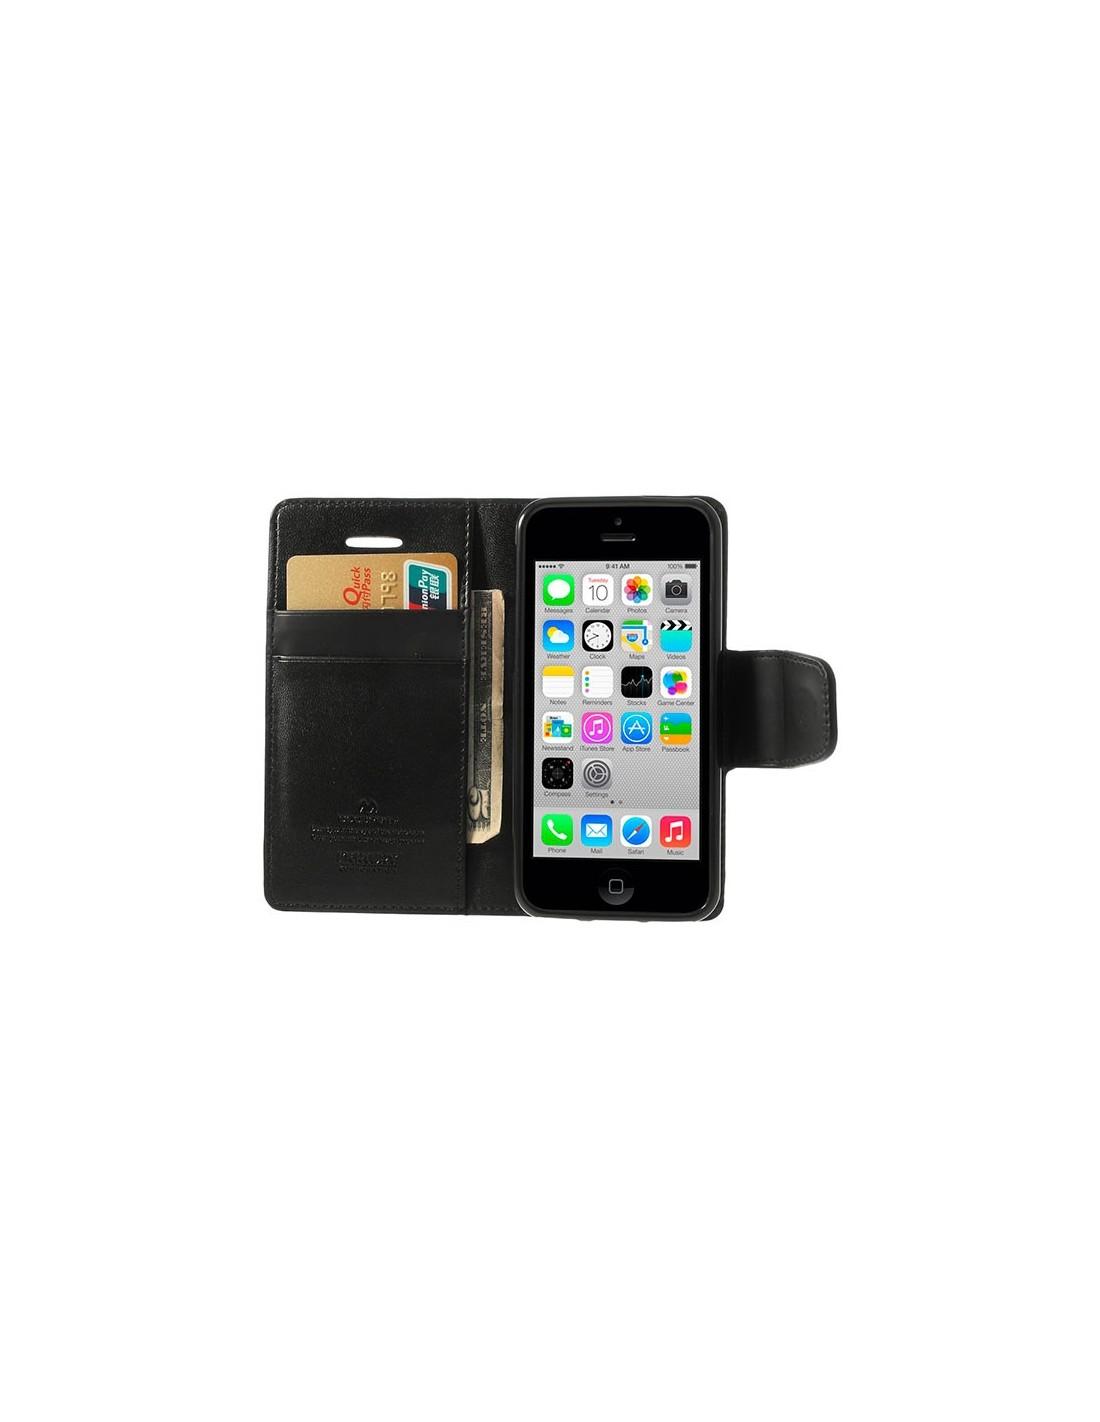 etui portefeuille simili cuir luxe pour iphone 5c. Black Bedroom Furniture Sets. Home Design Ideas